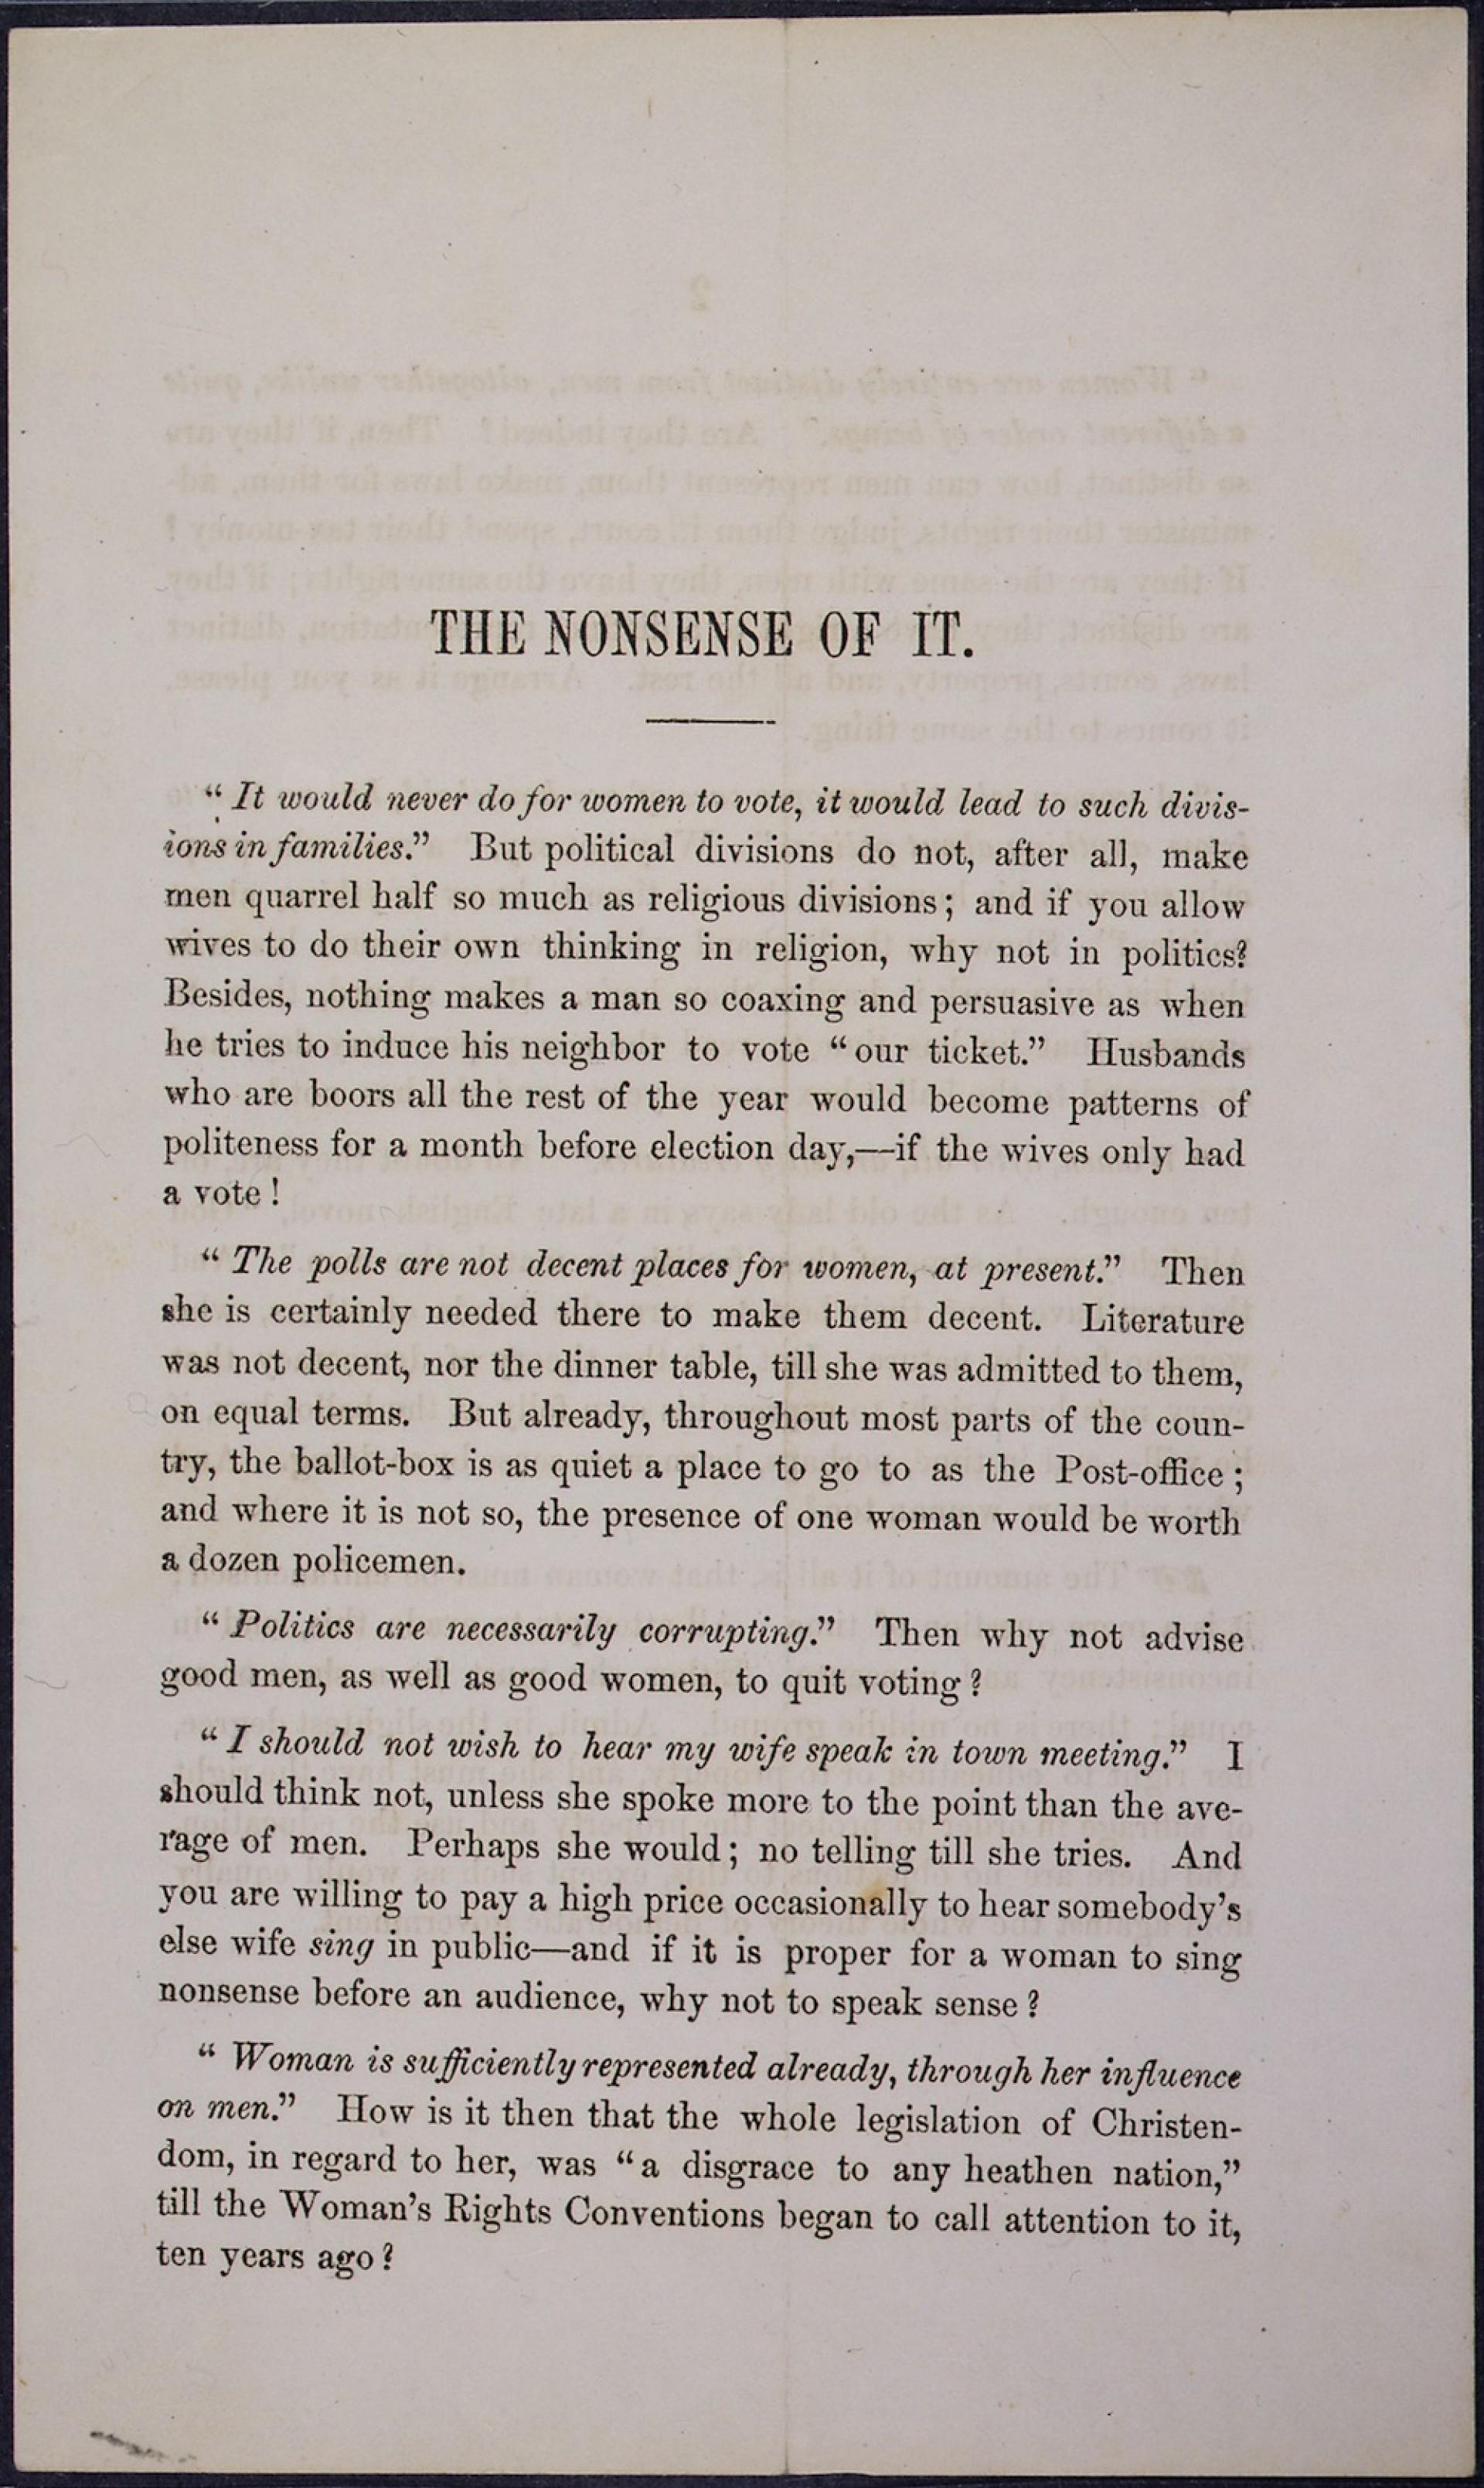 009 Suffragepamphlet1final Crop Original Essay Example Importance Of Unforgettable Voting In Tamil Pdf Marathi 1920